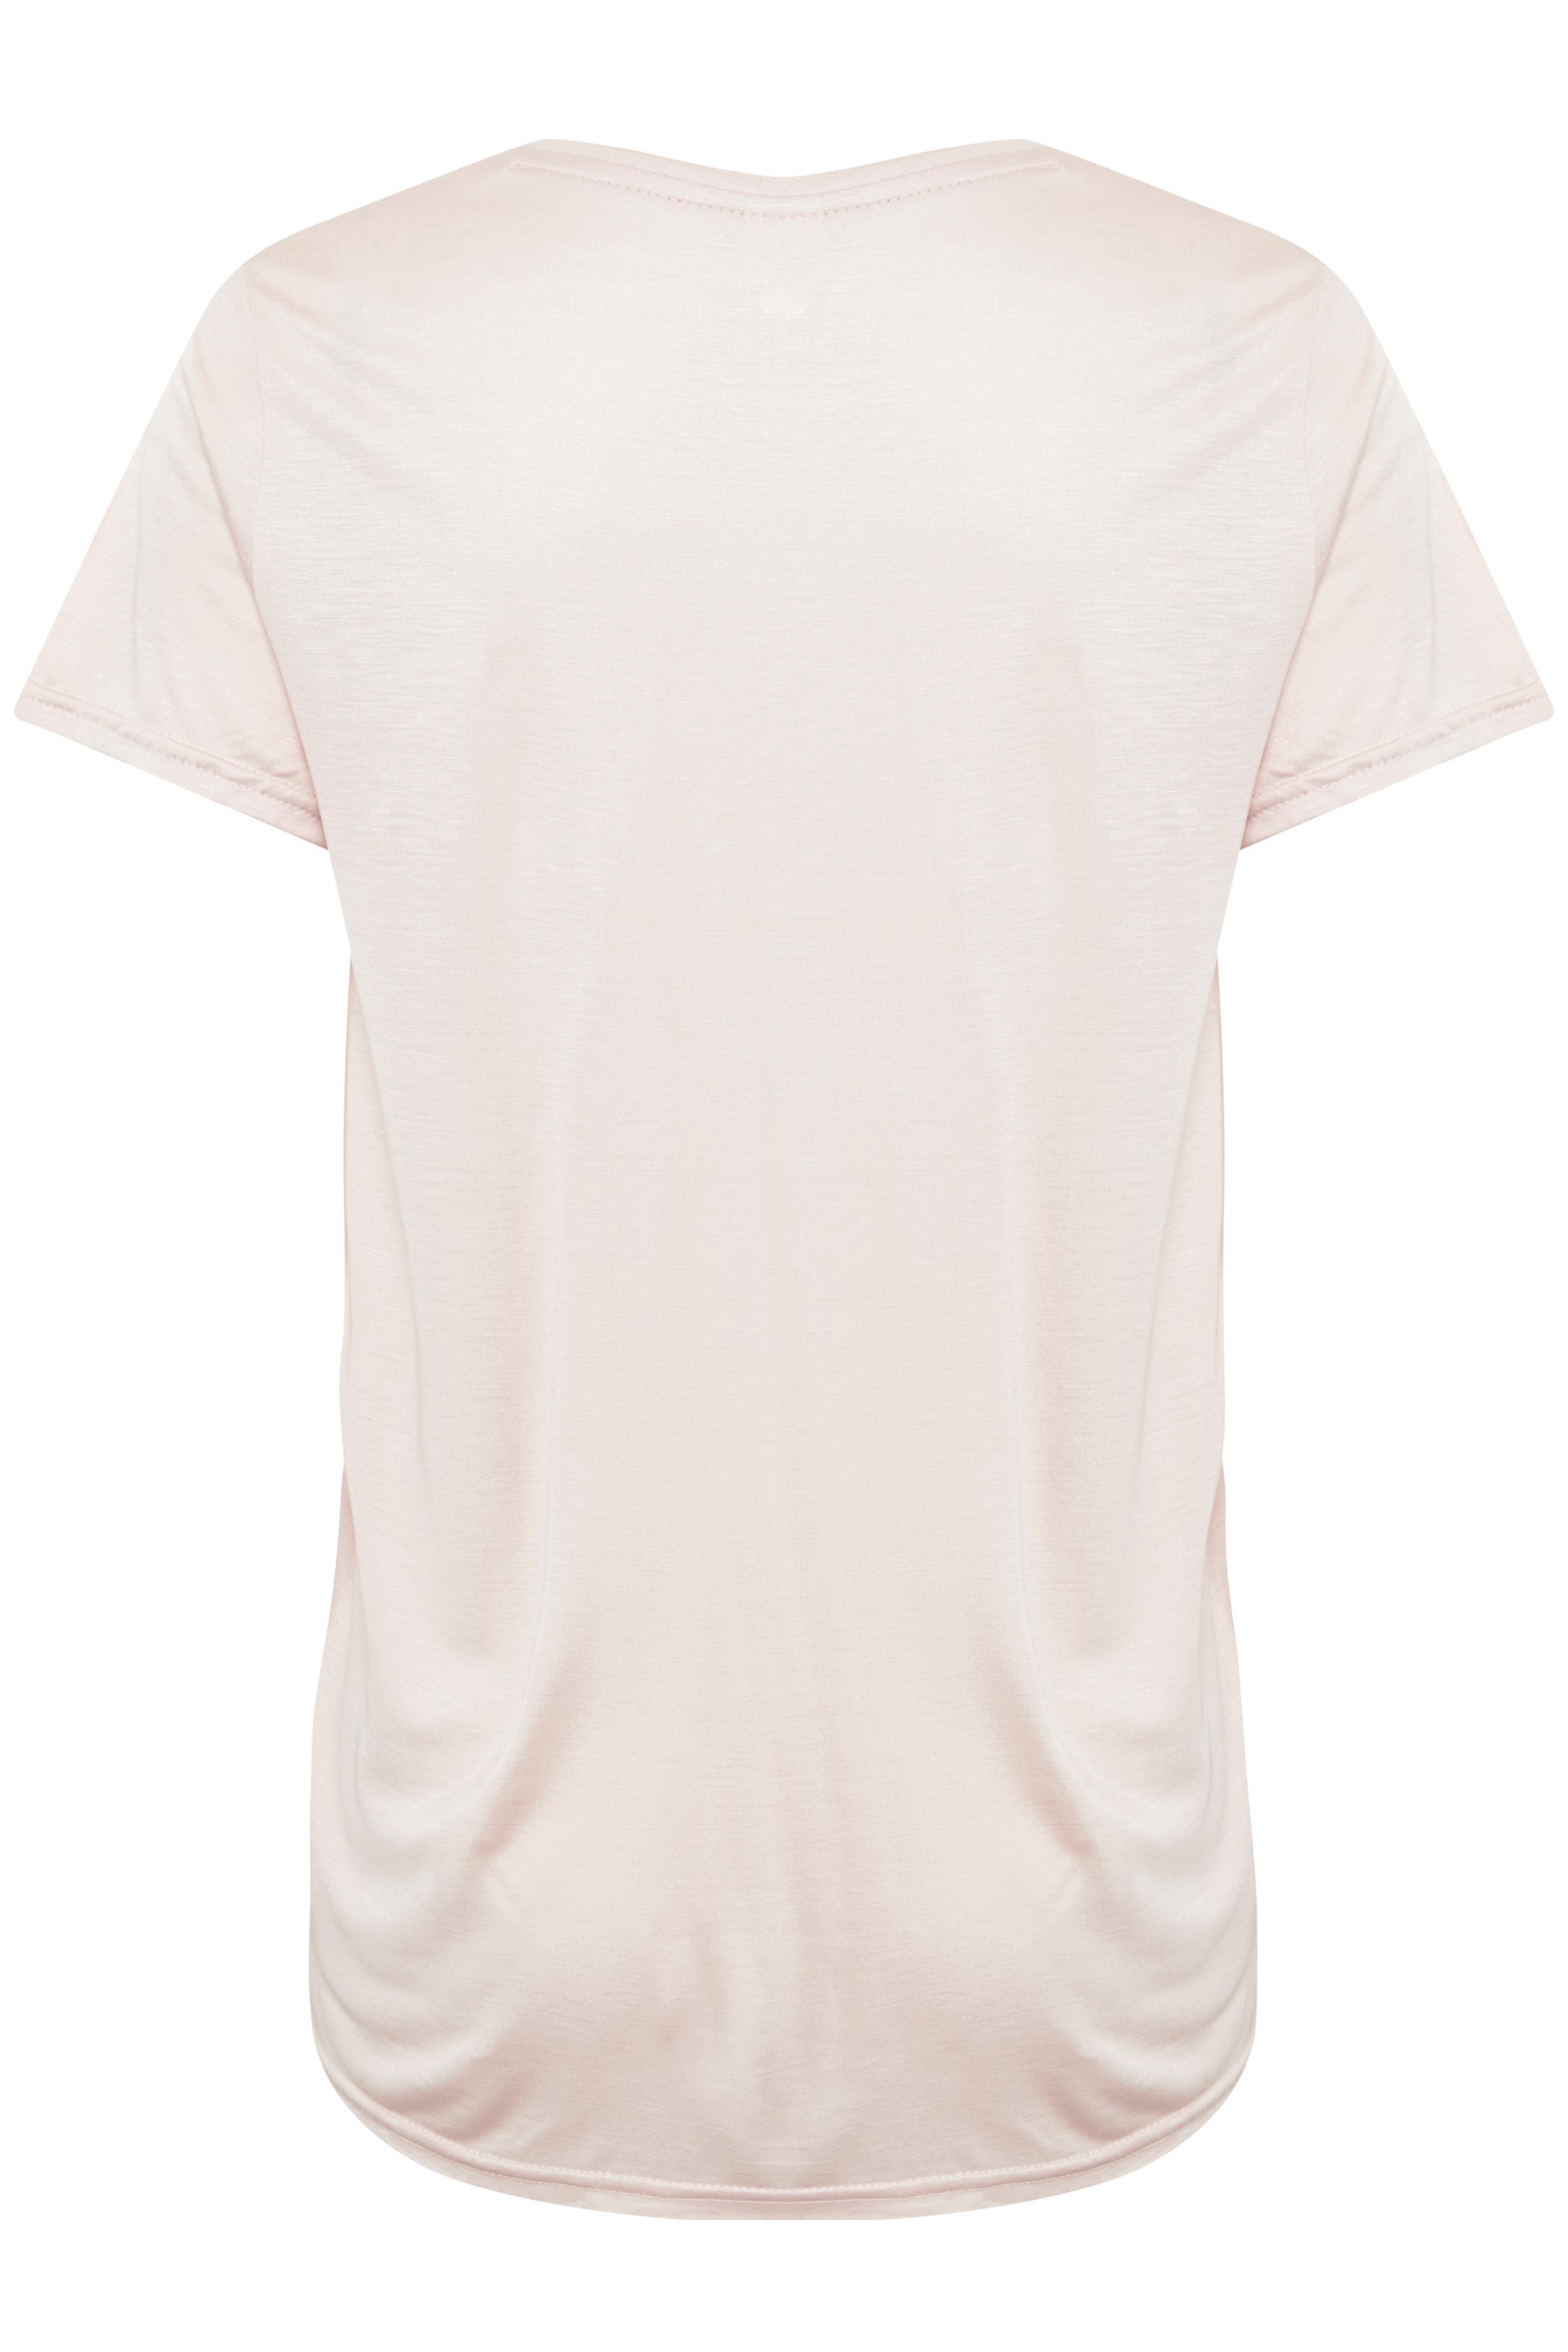 Lys rosa Kortærmet T-shirt fra Kaffe – Køb Lys rosa Kortærmet T-shirt fra str. XS-XXL her